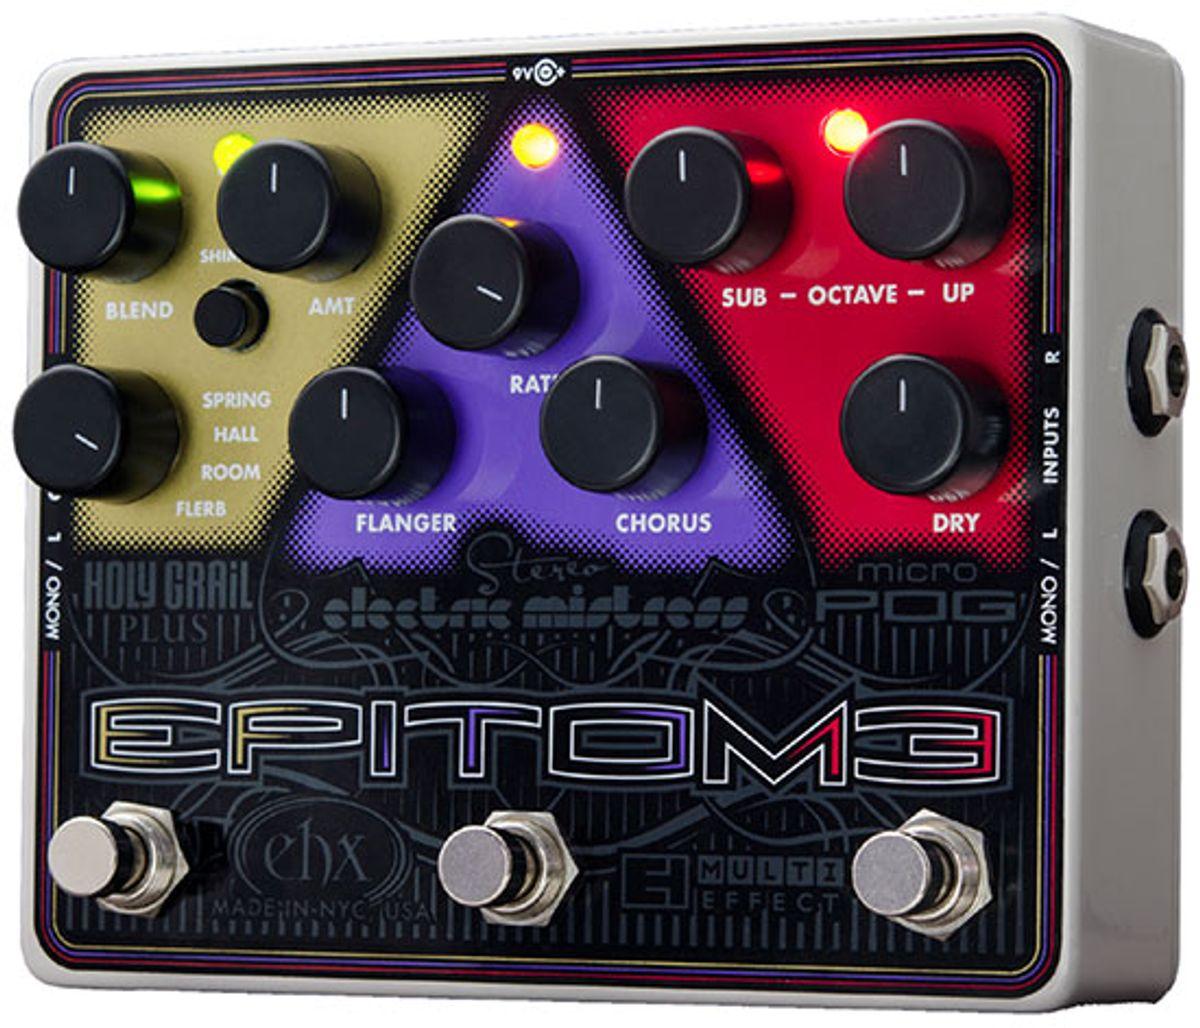 Electro-Harmonix Epitome Pedal Review & Demo